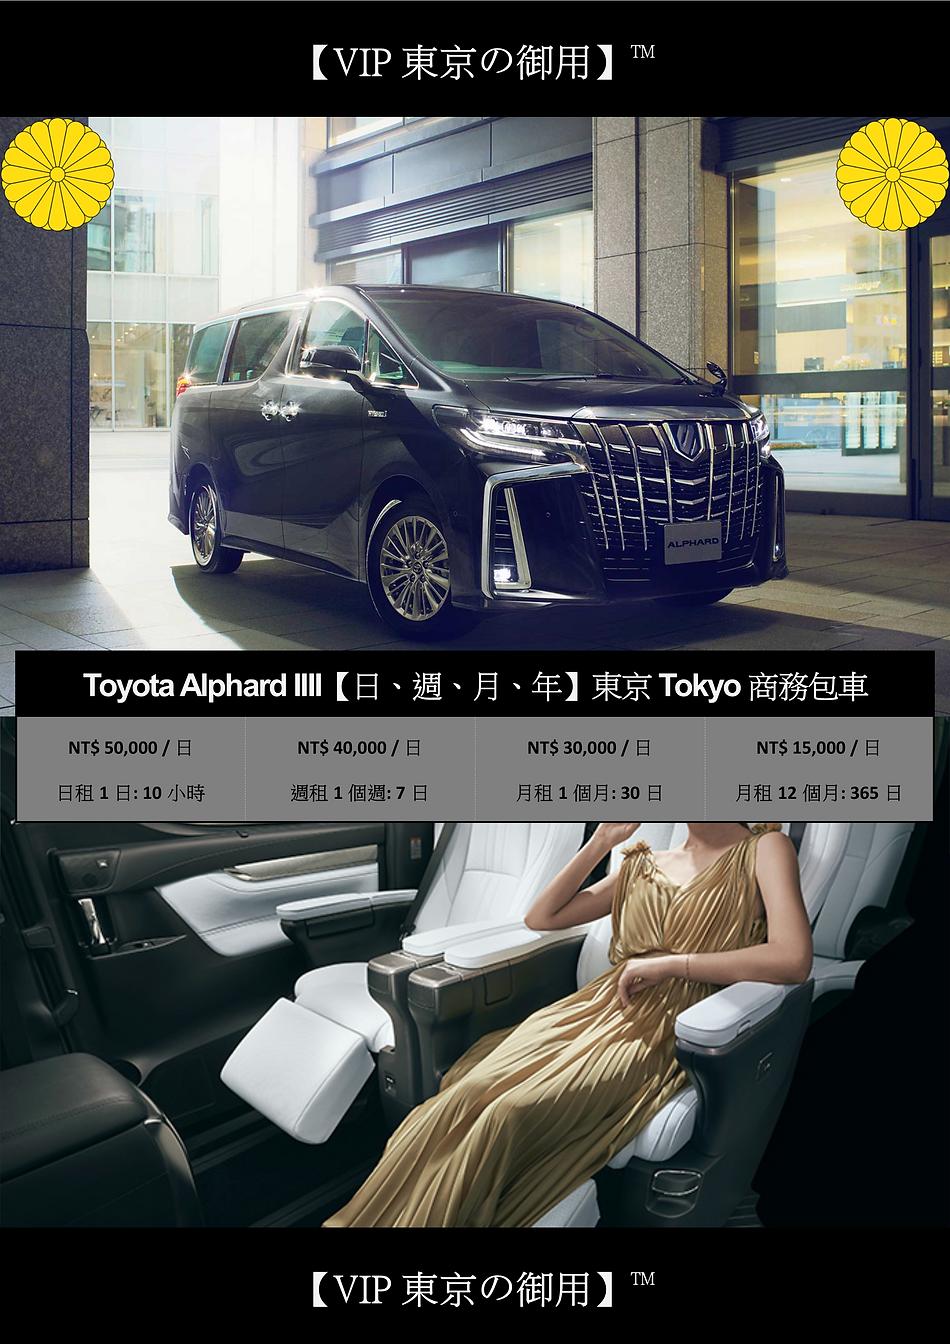 VIP東京の御用 TOYOTA ALPHARD IIII DM.png